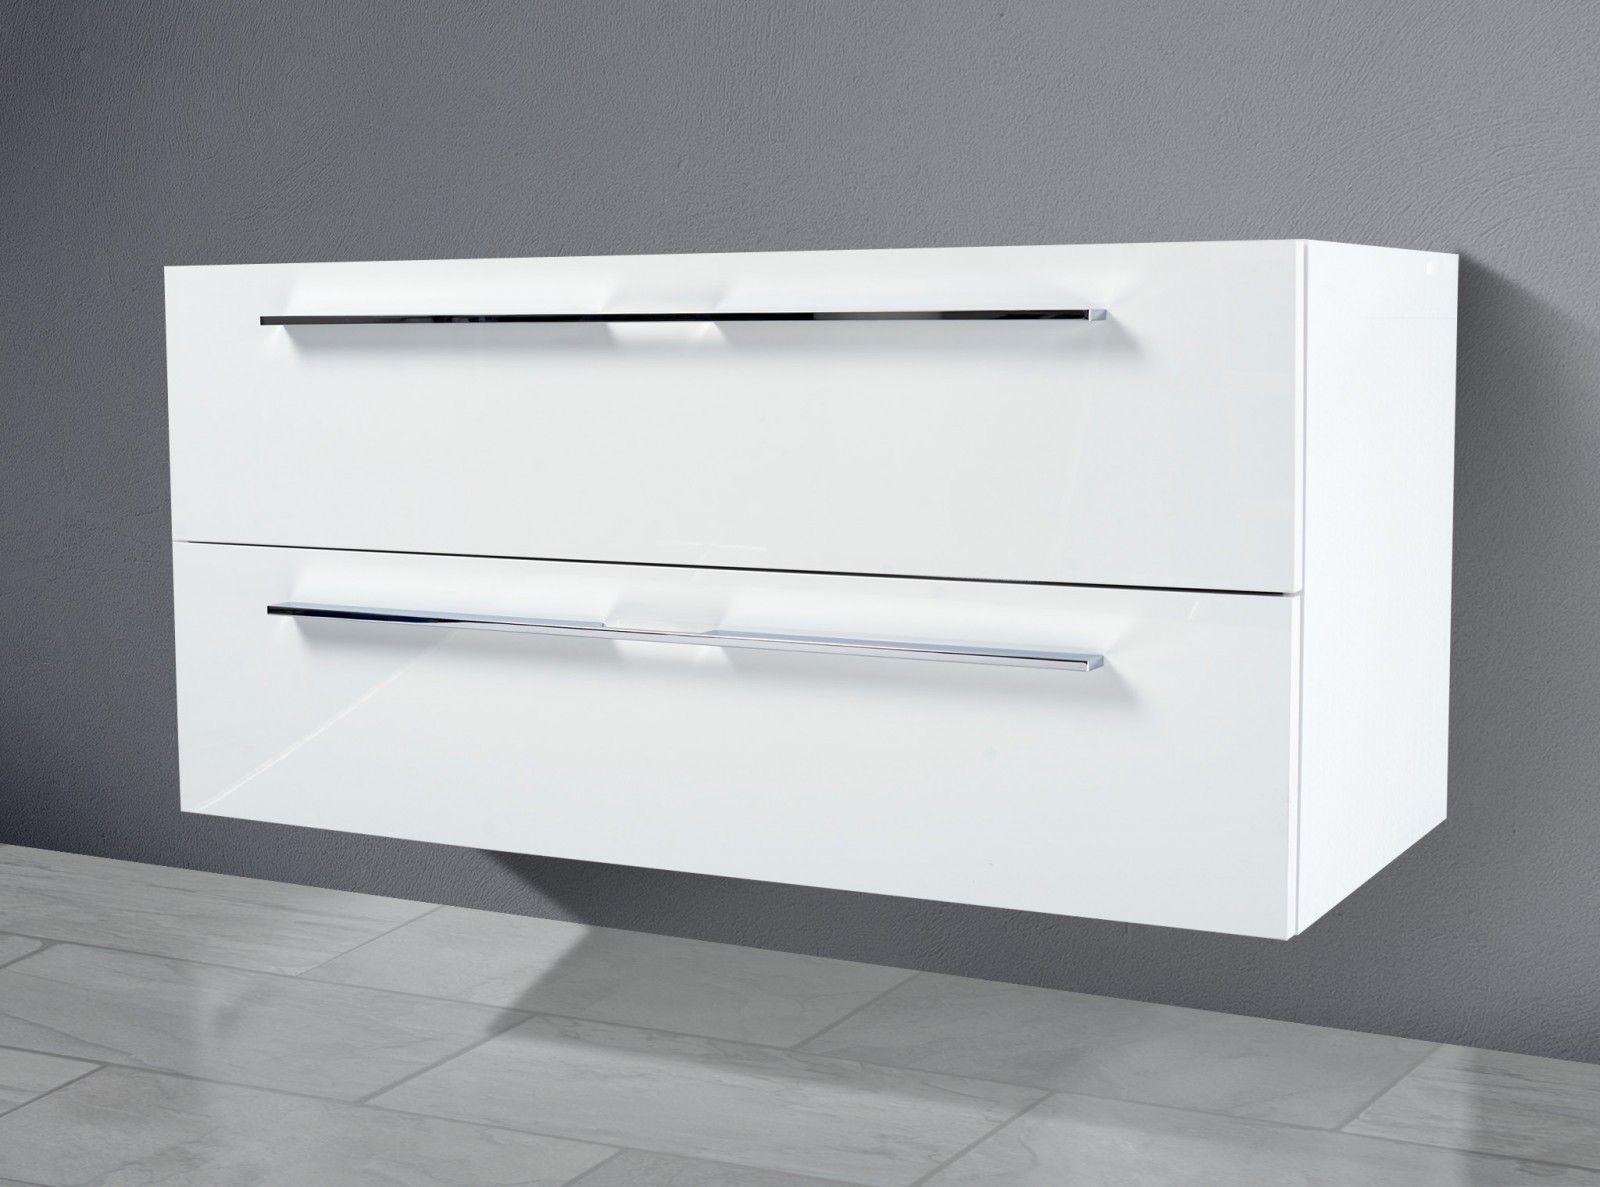 doppelwaschtisch villeroy boch. Black Bedroom Furniture Sets. Home Design Ideas